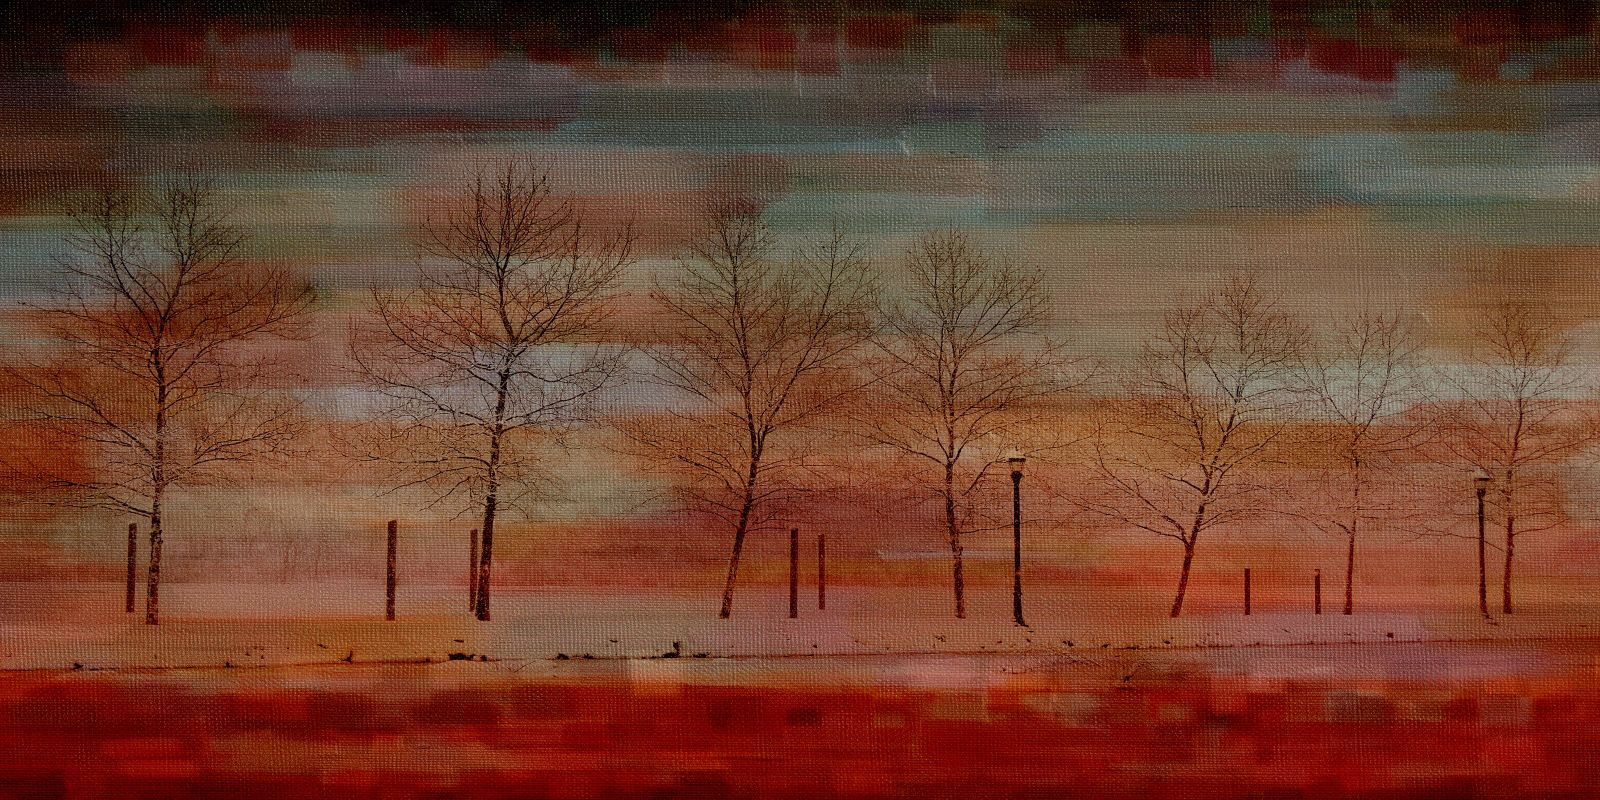 Parvez Taj Deep Red View Art Print on Premium Canvas 30 x 60 Home